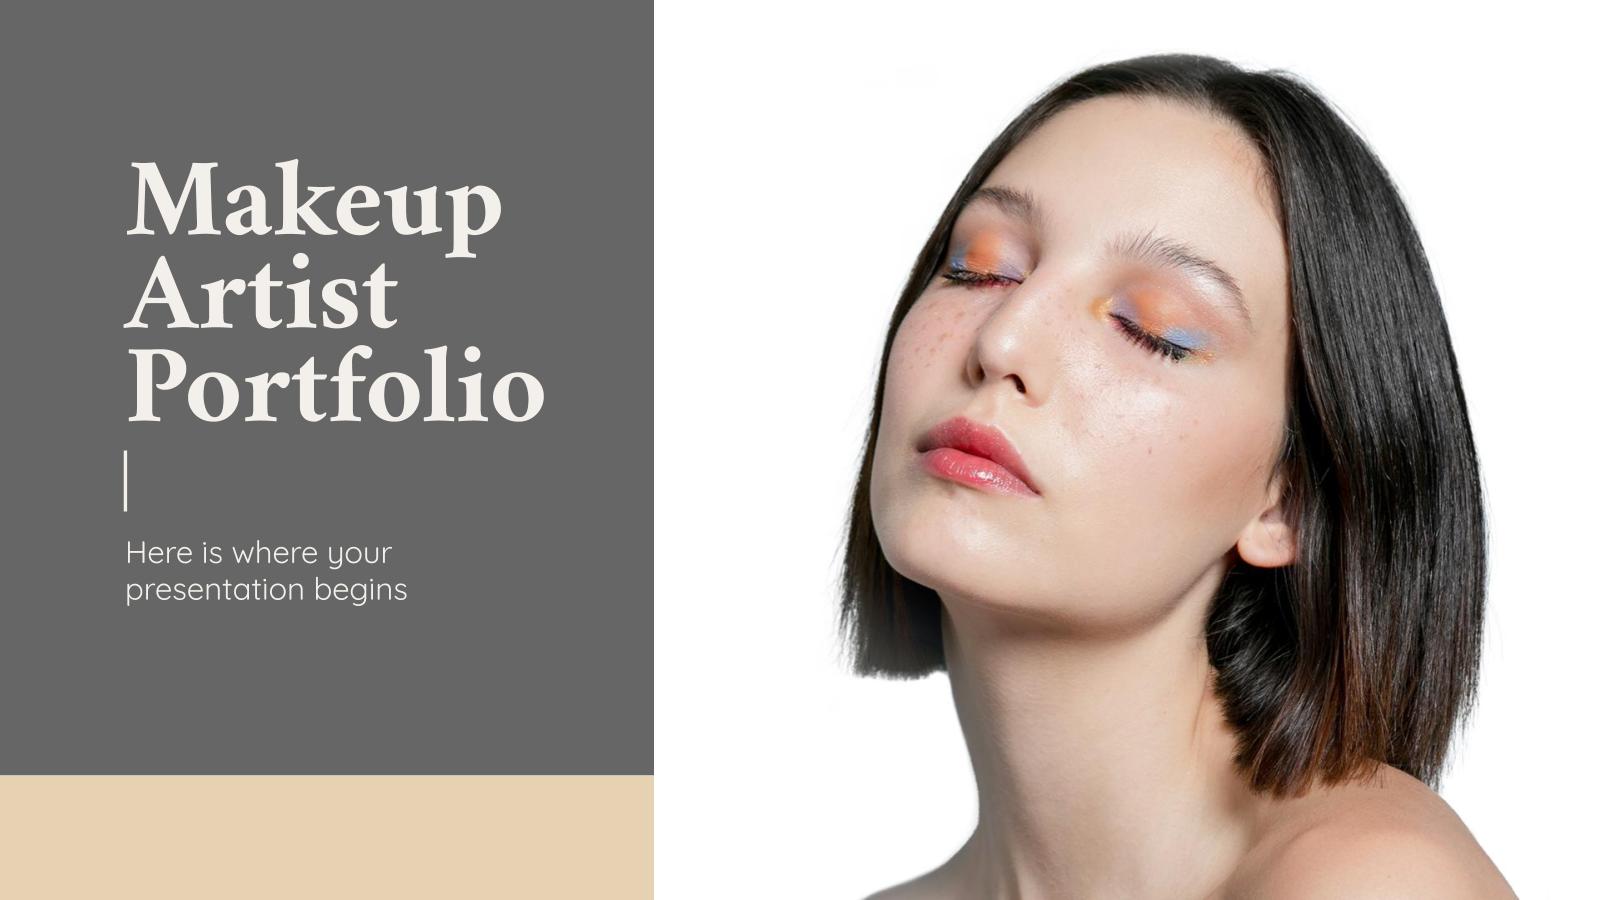 Makeup Artist Portfolio presentation template